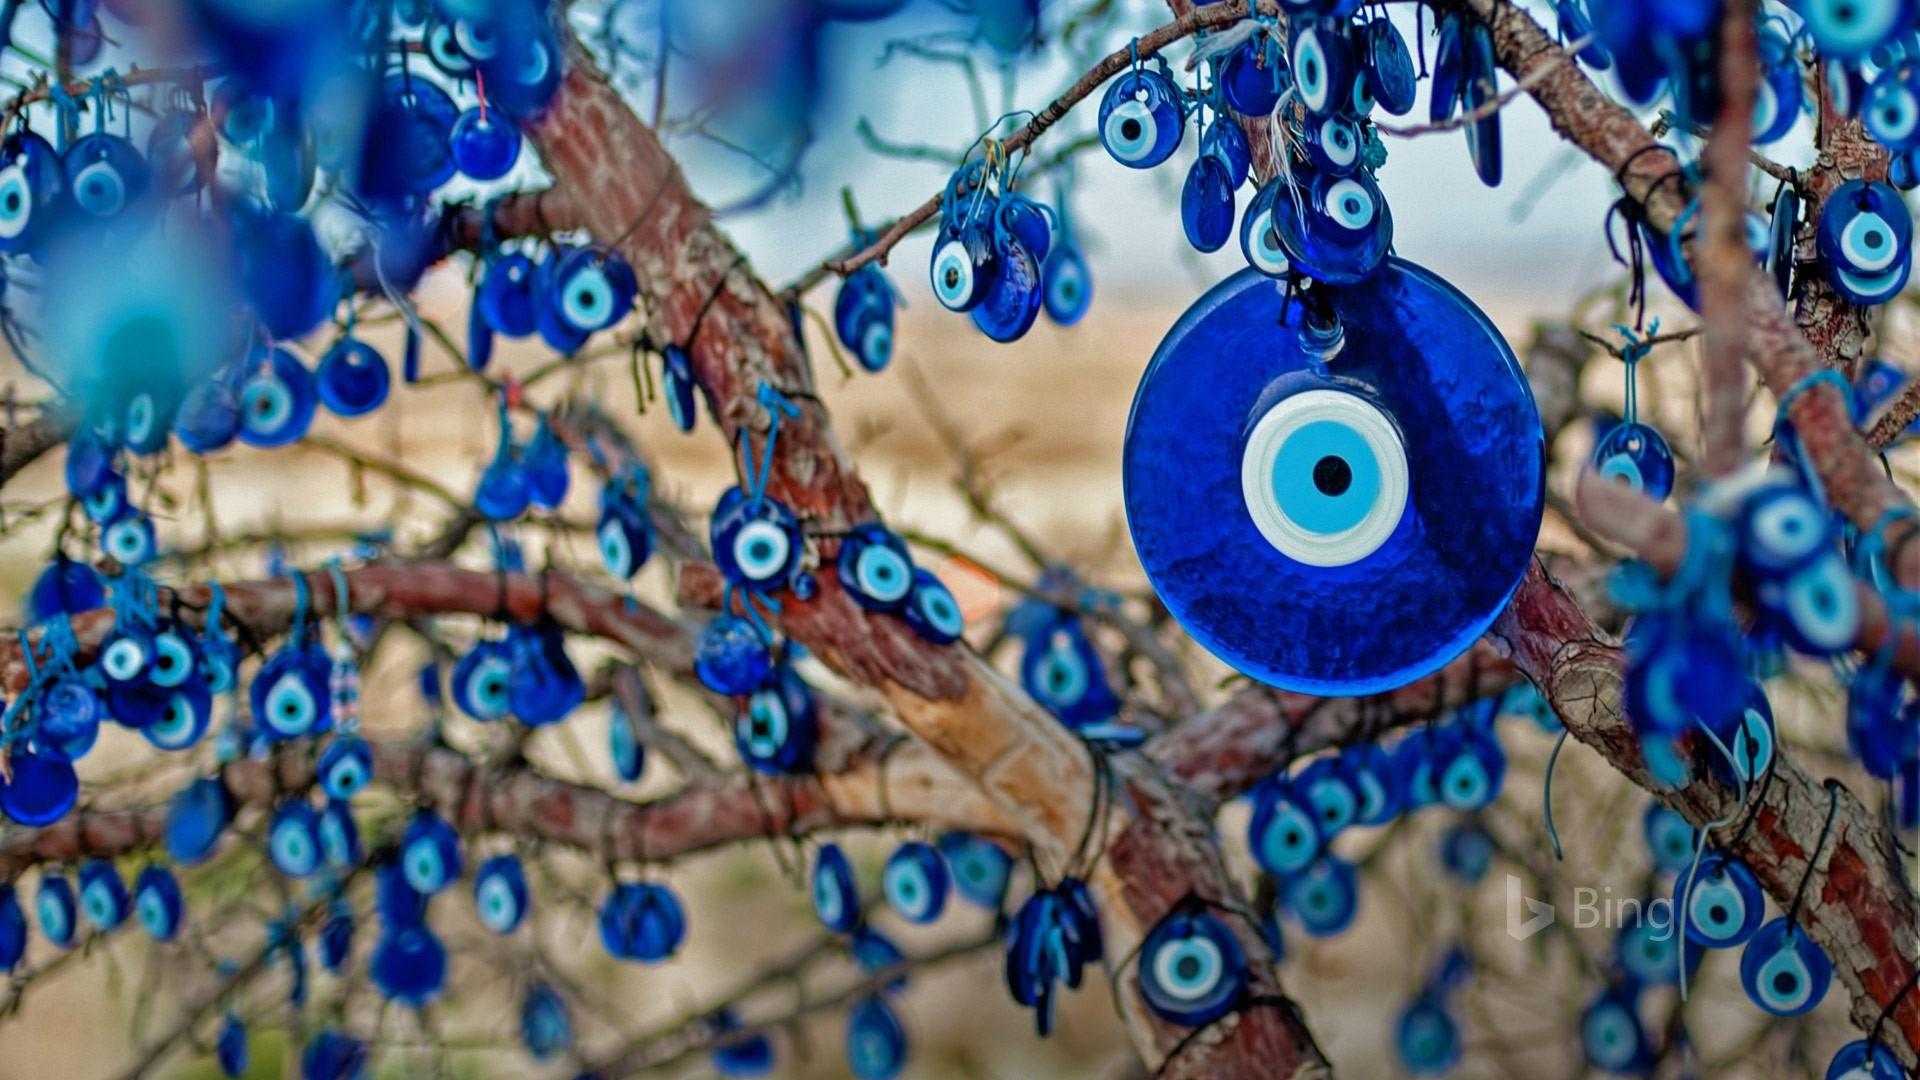 Turkey Goreme National Park Wish Tree 2018 Bing Preview